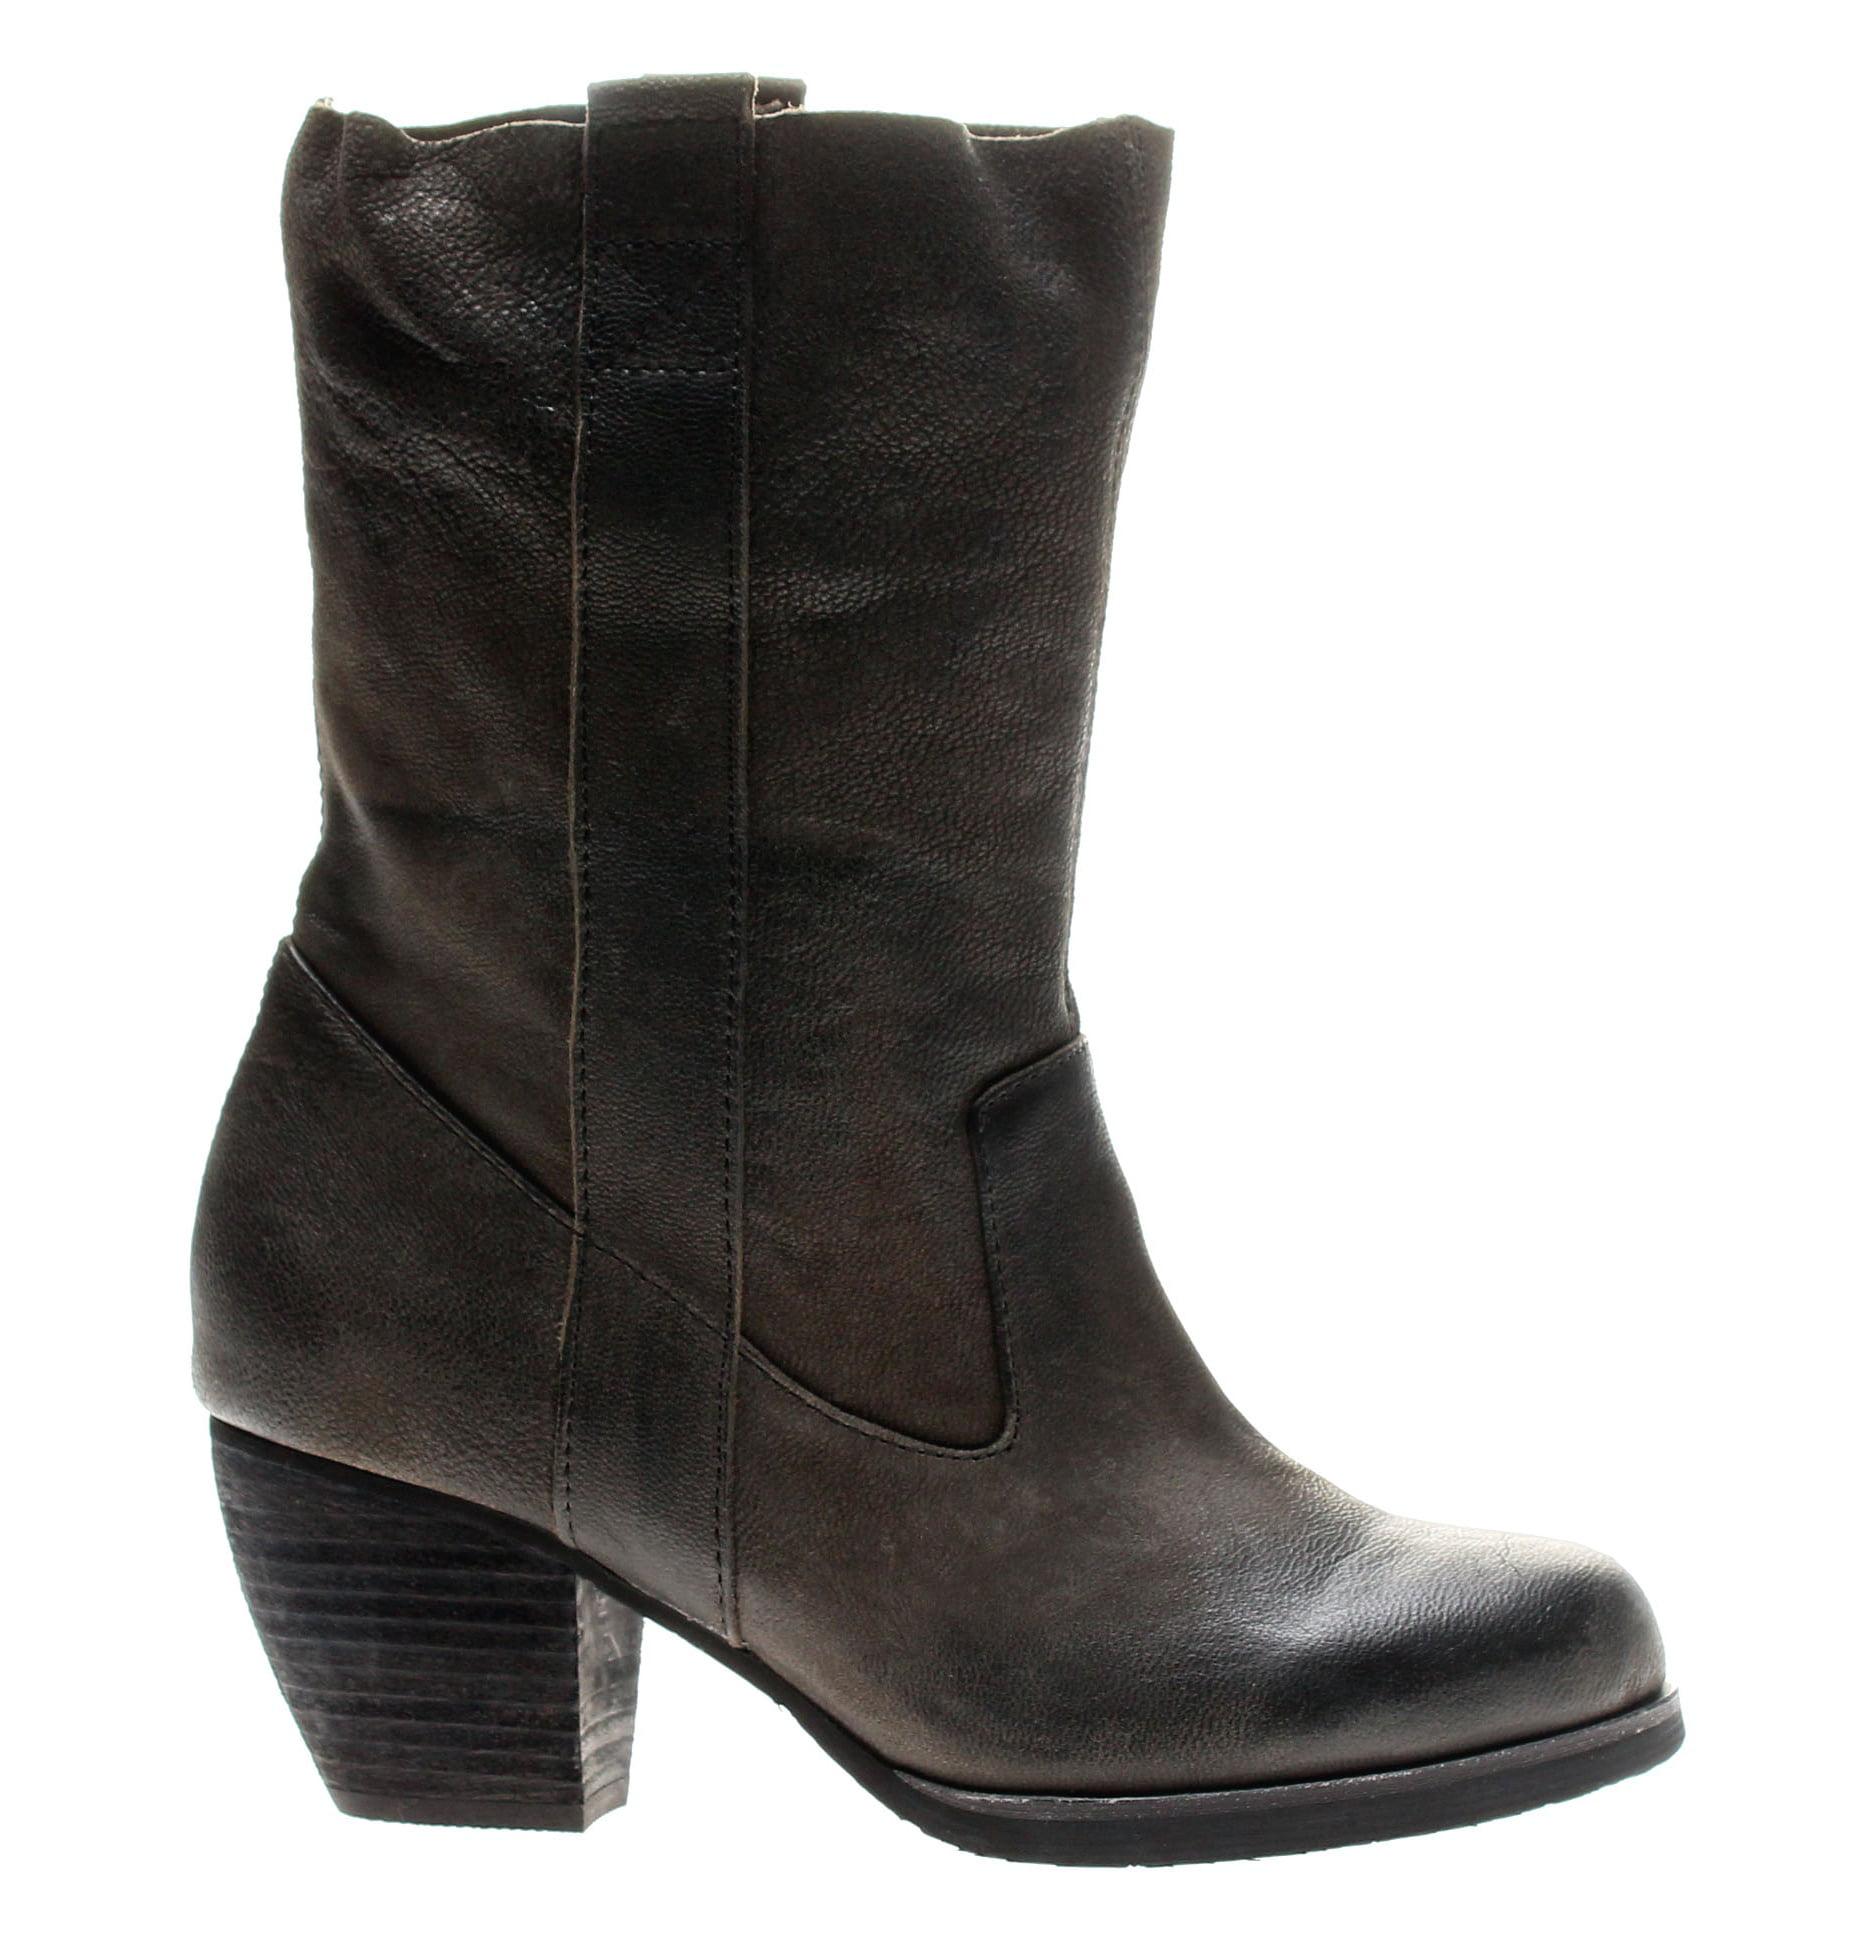 Antelope Booties 663 Ankle Booties Antelope Black Women's Boots 663-Black daacd8